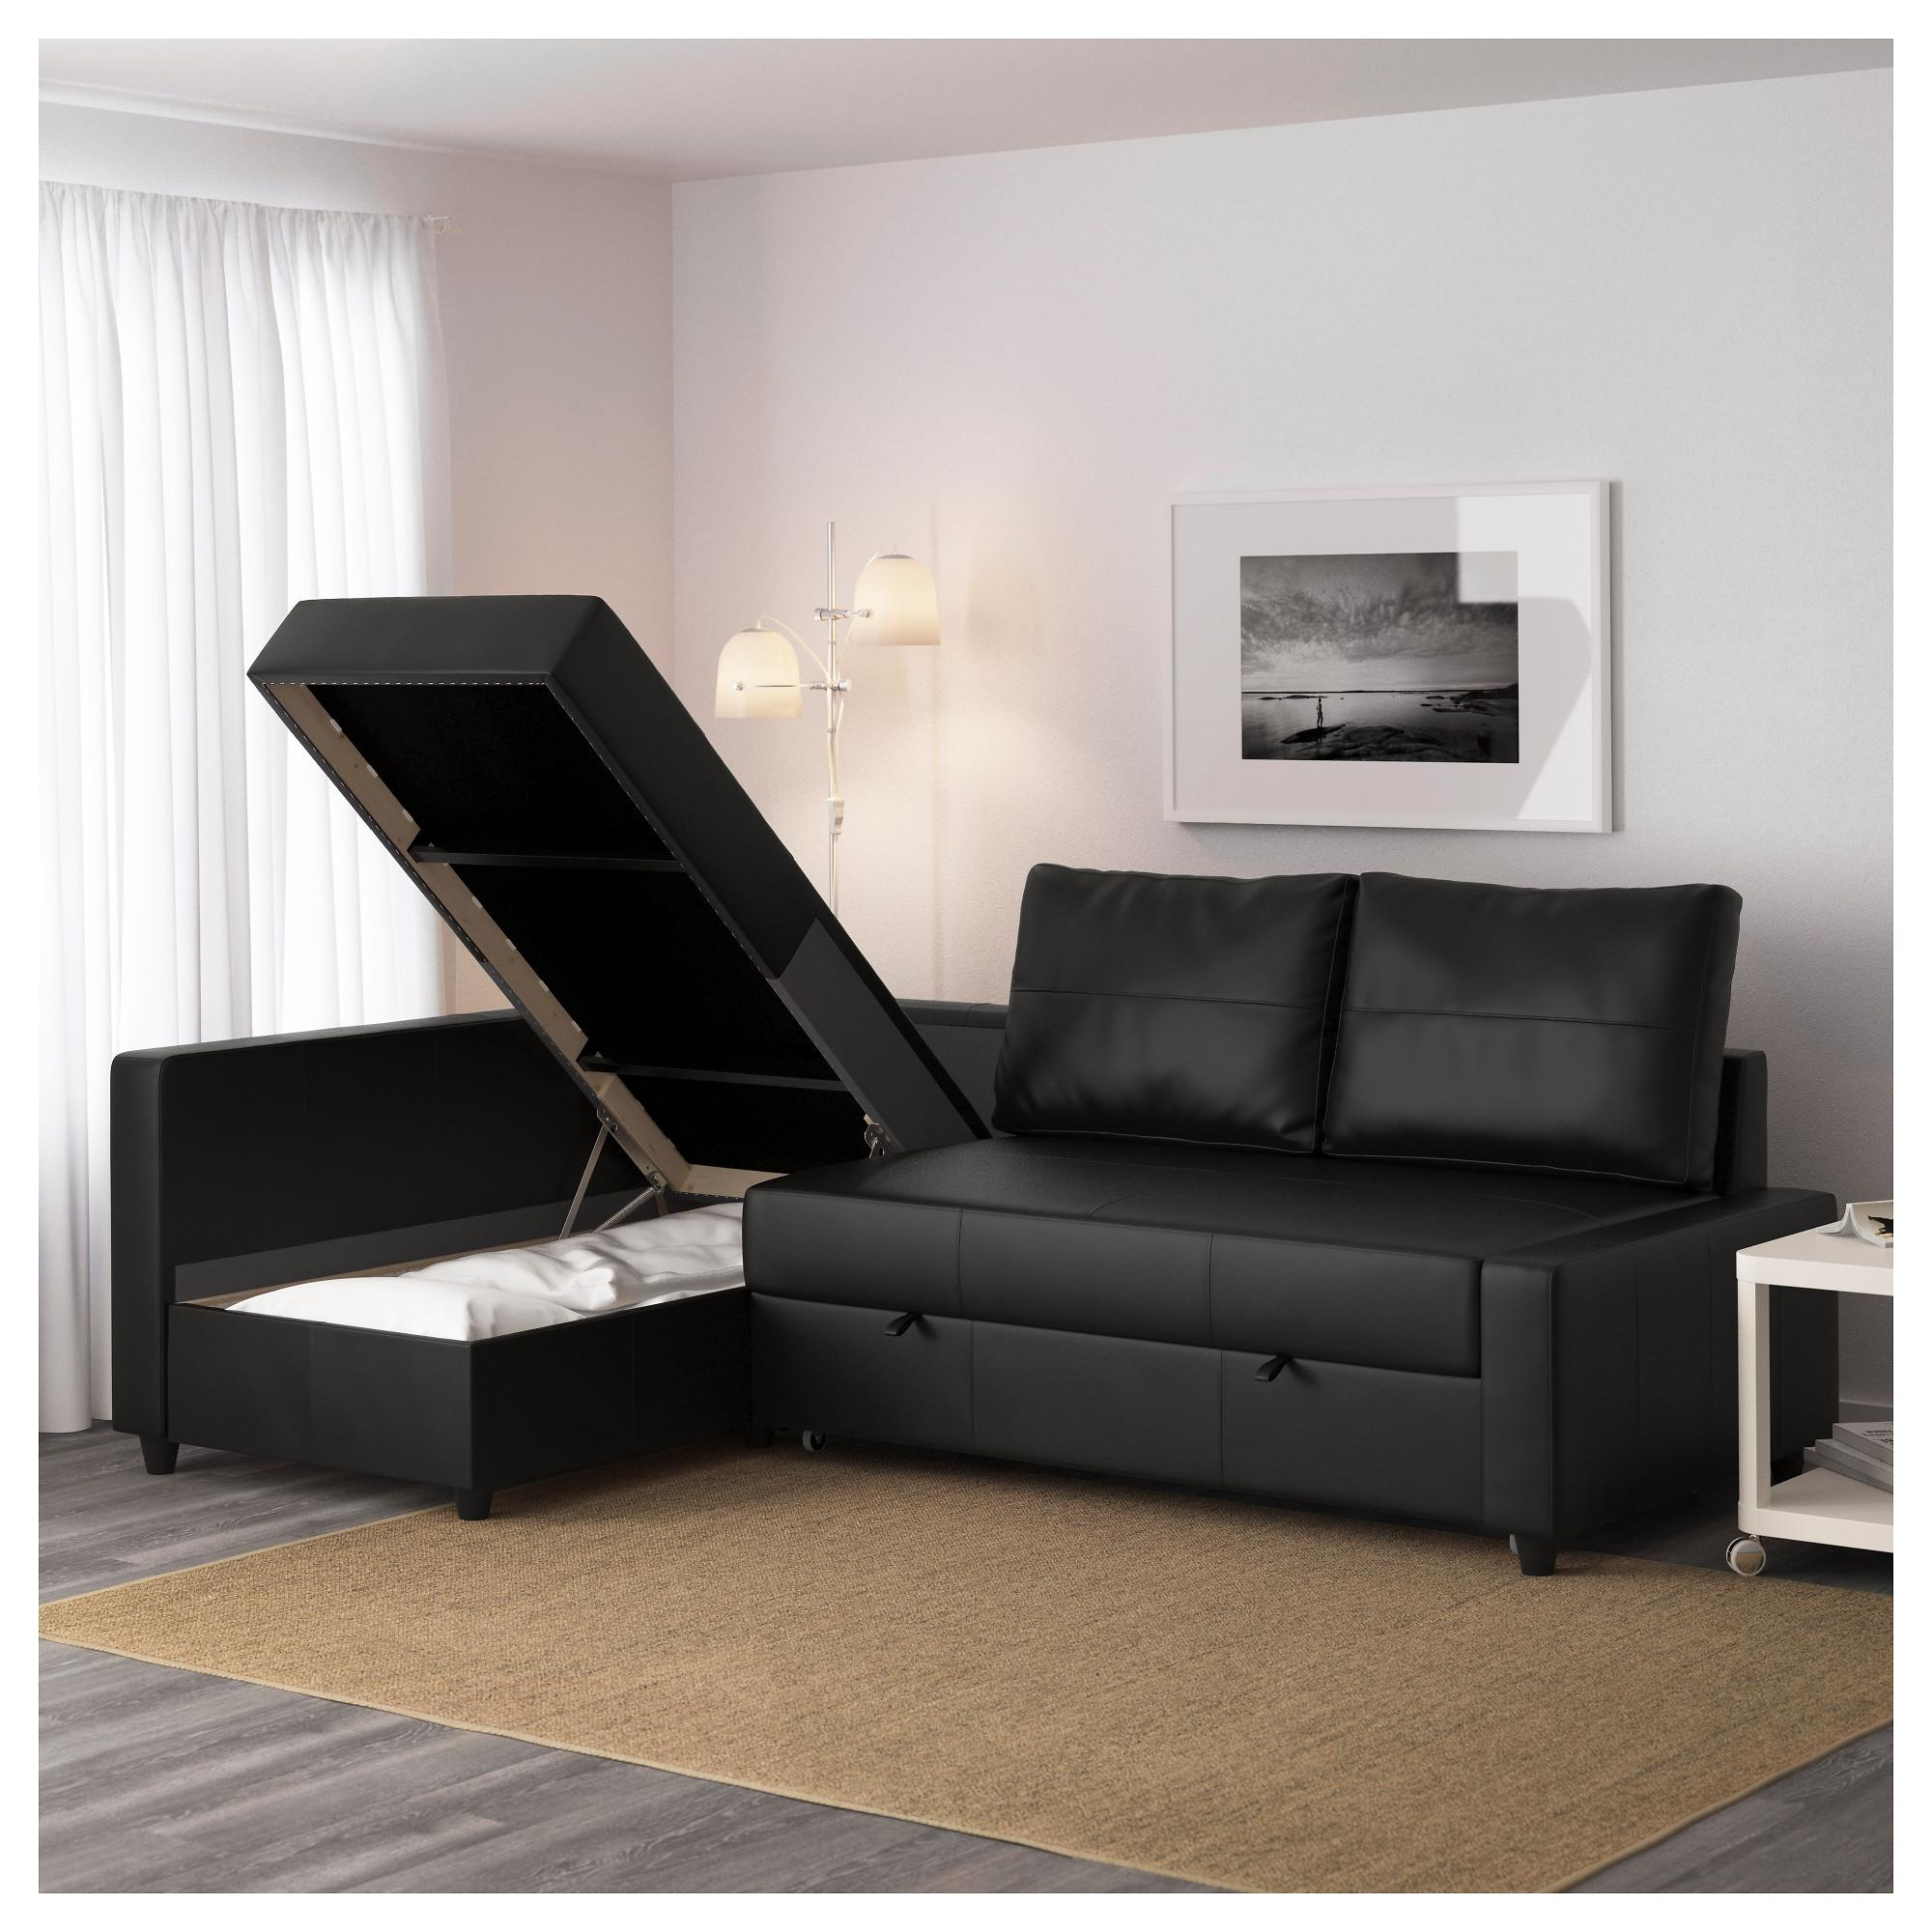 Friheten Sleeper Sectional,3 Seat W/storage – Skiftebo Dark Gray Regarding Storage Sofa Ikea (View 2 of 20)